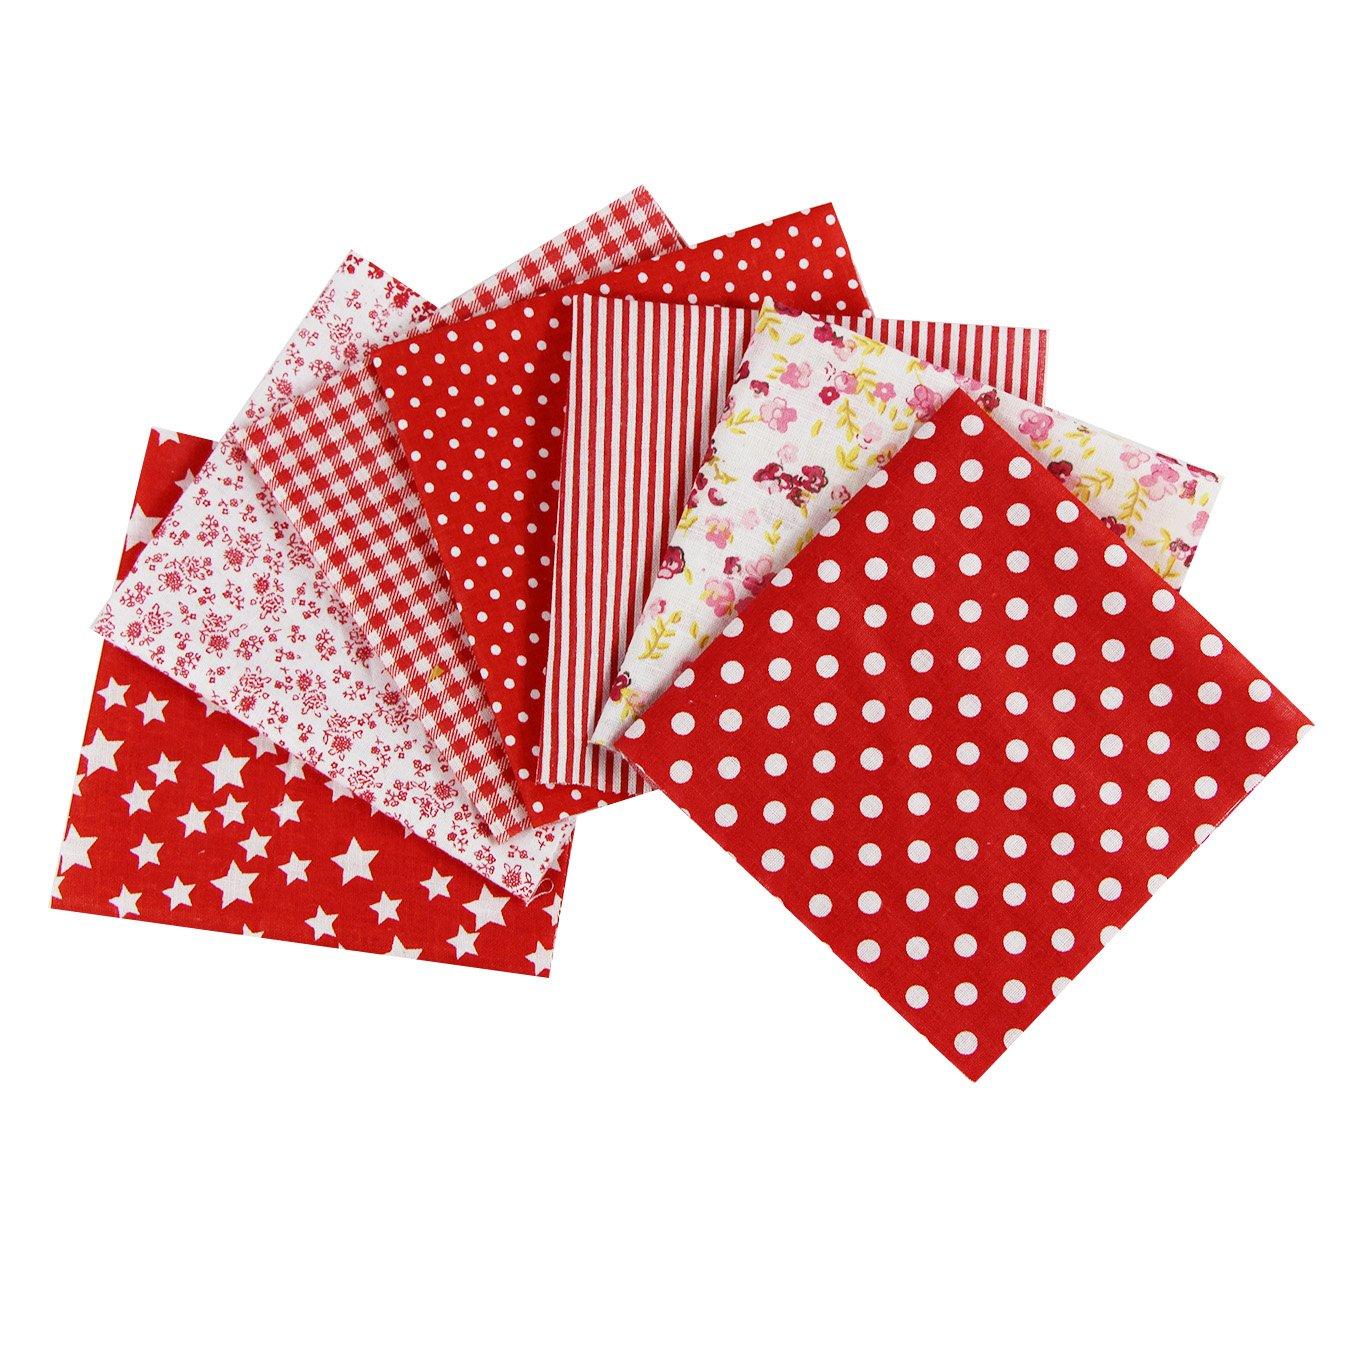 UOOOM 7 pcs Cotton Patchwork Fabric Square of 25 x 25cm Sewing Quilting Scrapbooking DIY Artcraft (Purple) ZHICHENG